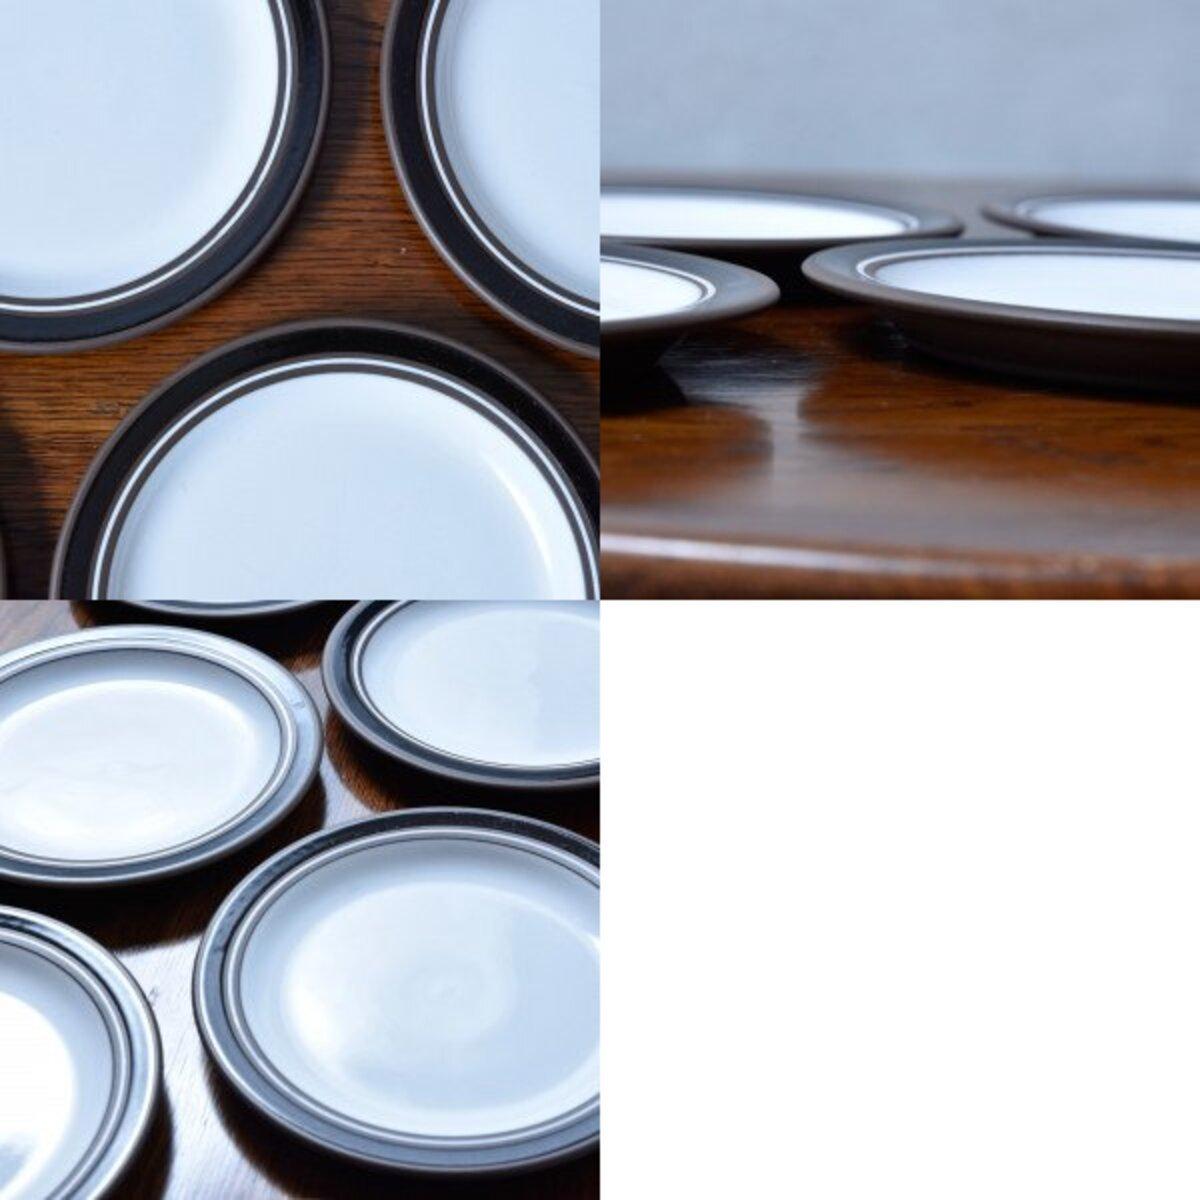 IZ45603I○6枚セット HORNSEA コントラスト ケーキプレート 16cm 英国 食器 ヴィンテージ ホーンジー Contrast ケーキ皿 デザートプレート_画像8